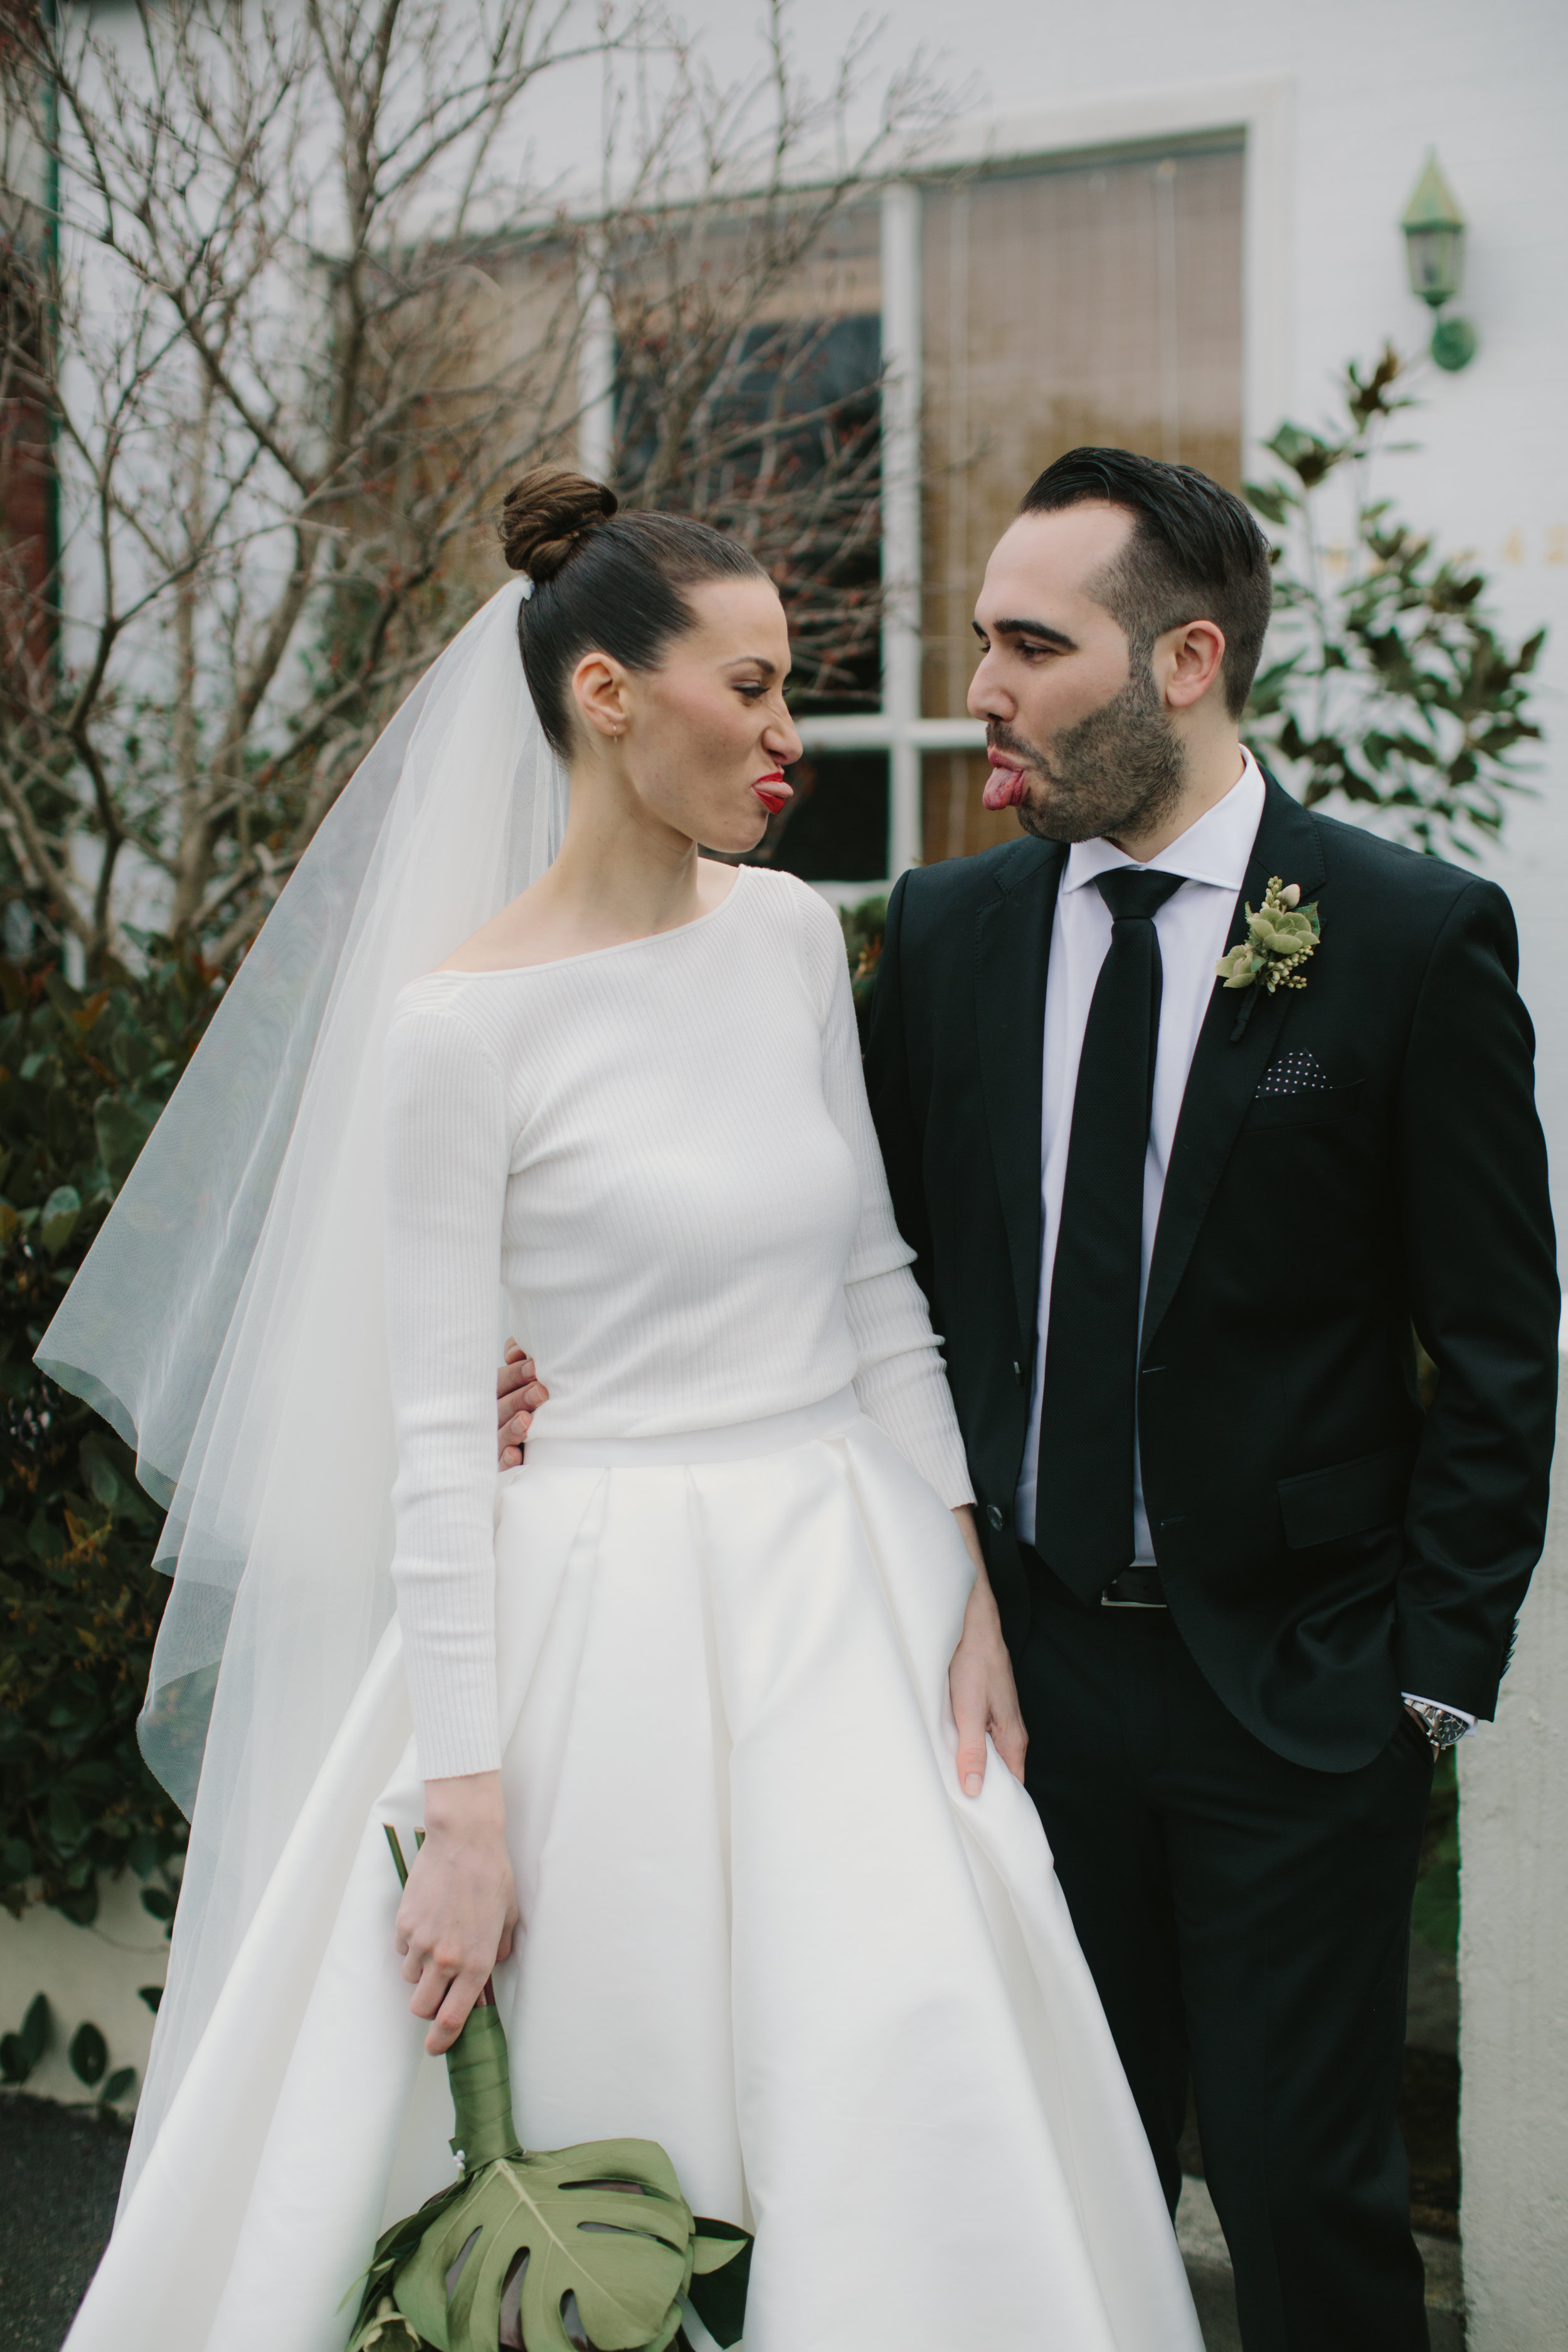 I-Got-You-Babe-Weddings-Laryssa-Adrian_2017-08-260514.JPG